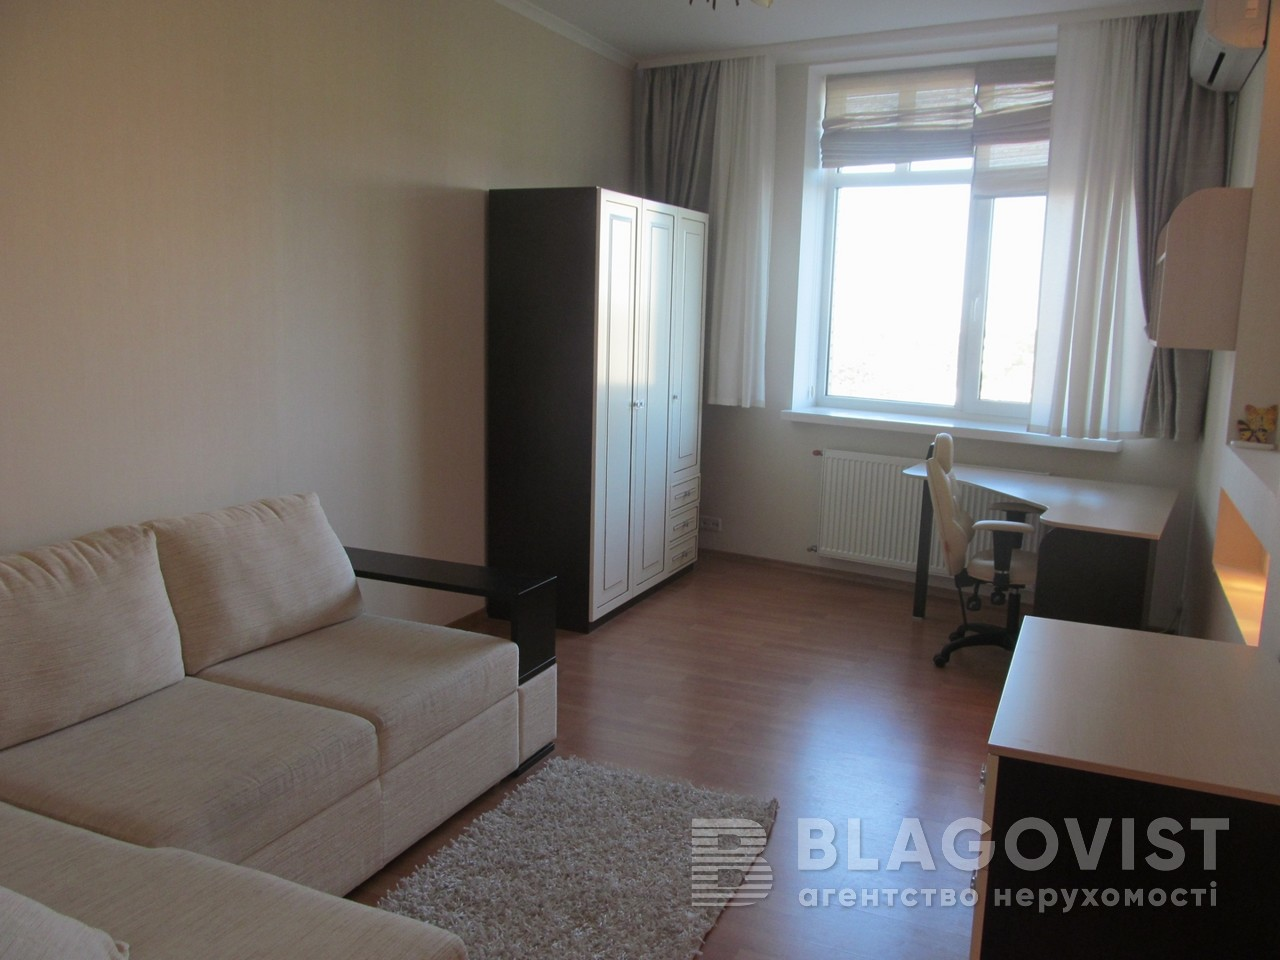 Квартира C-100029, Старонаводницкая, 6б, Киев - Фото 11